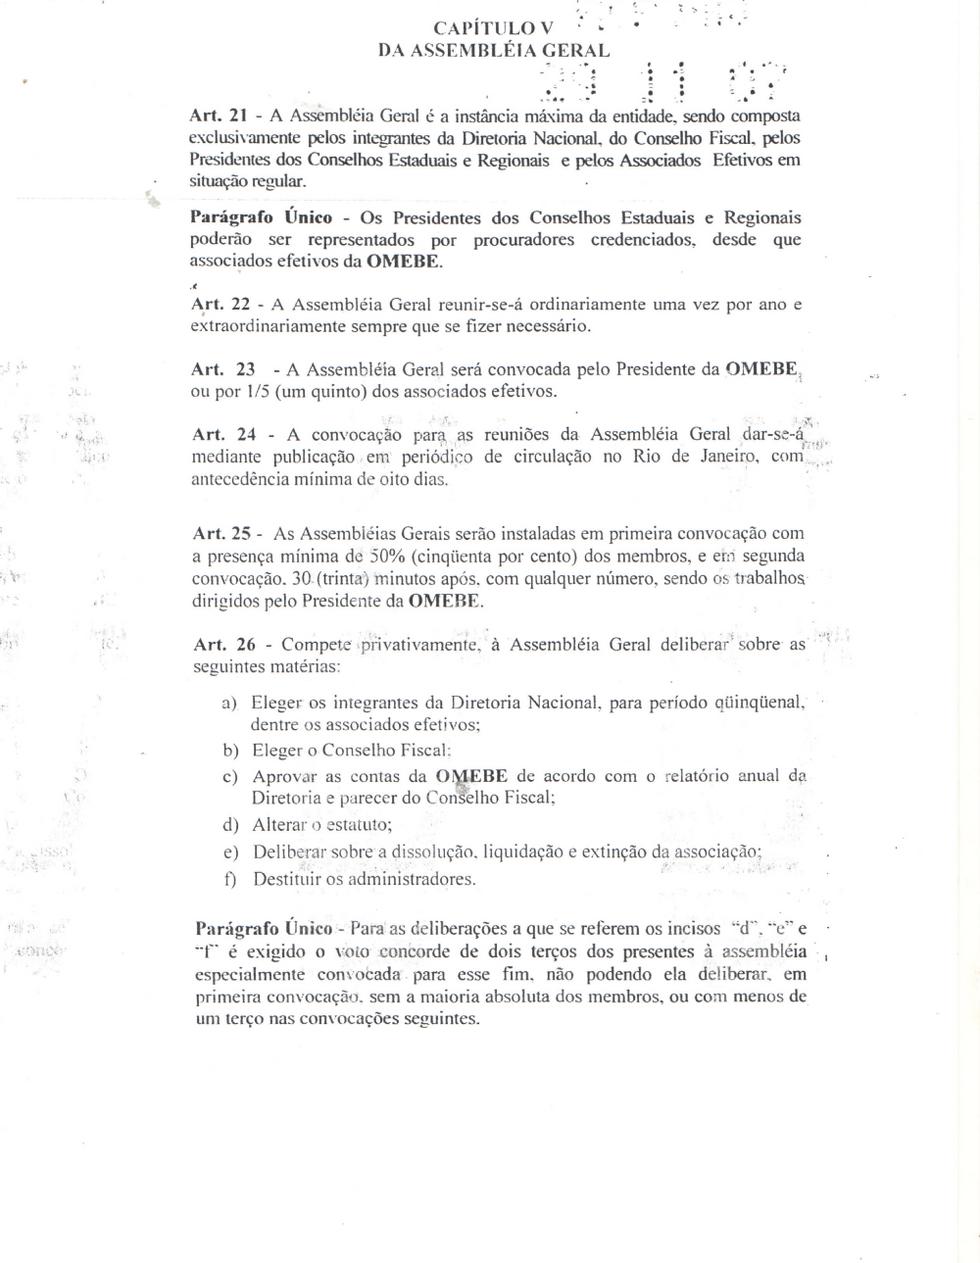 Estatuto-pag-6.png